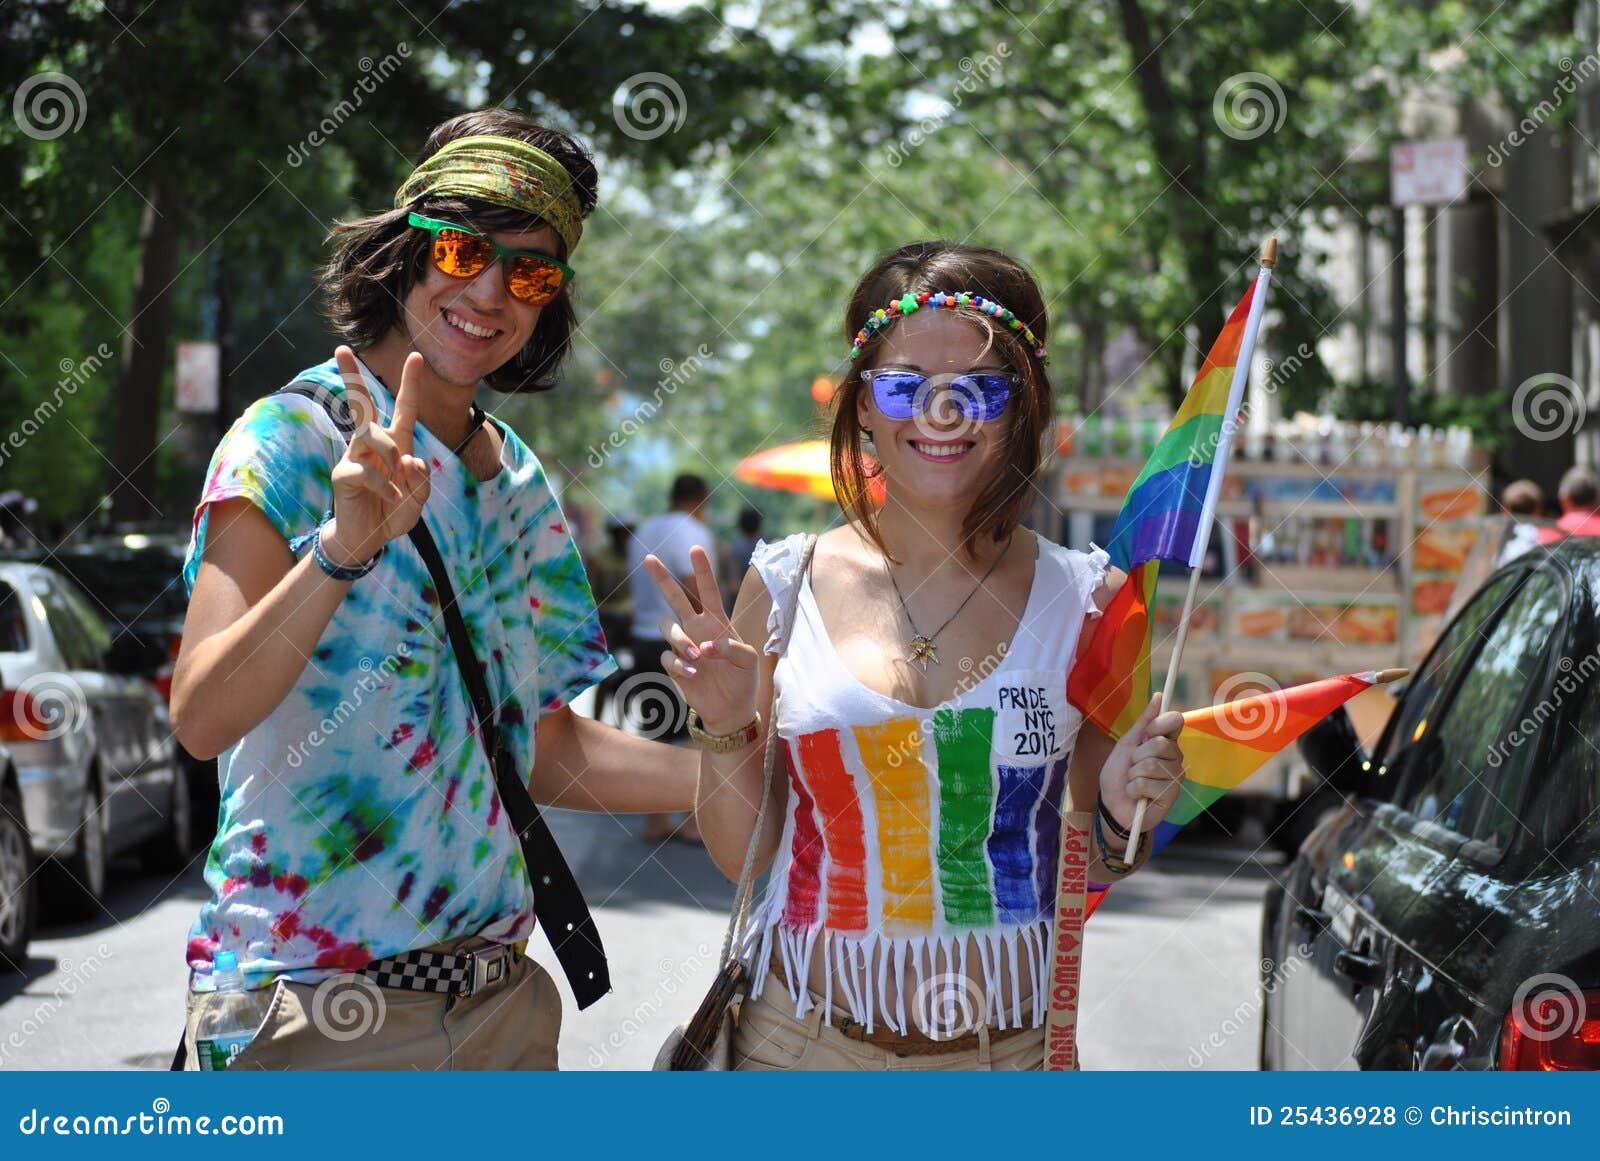 cruisin the streets gay